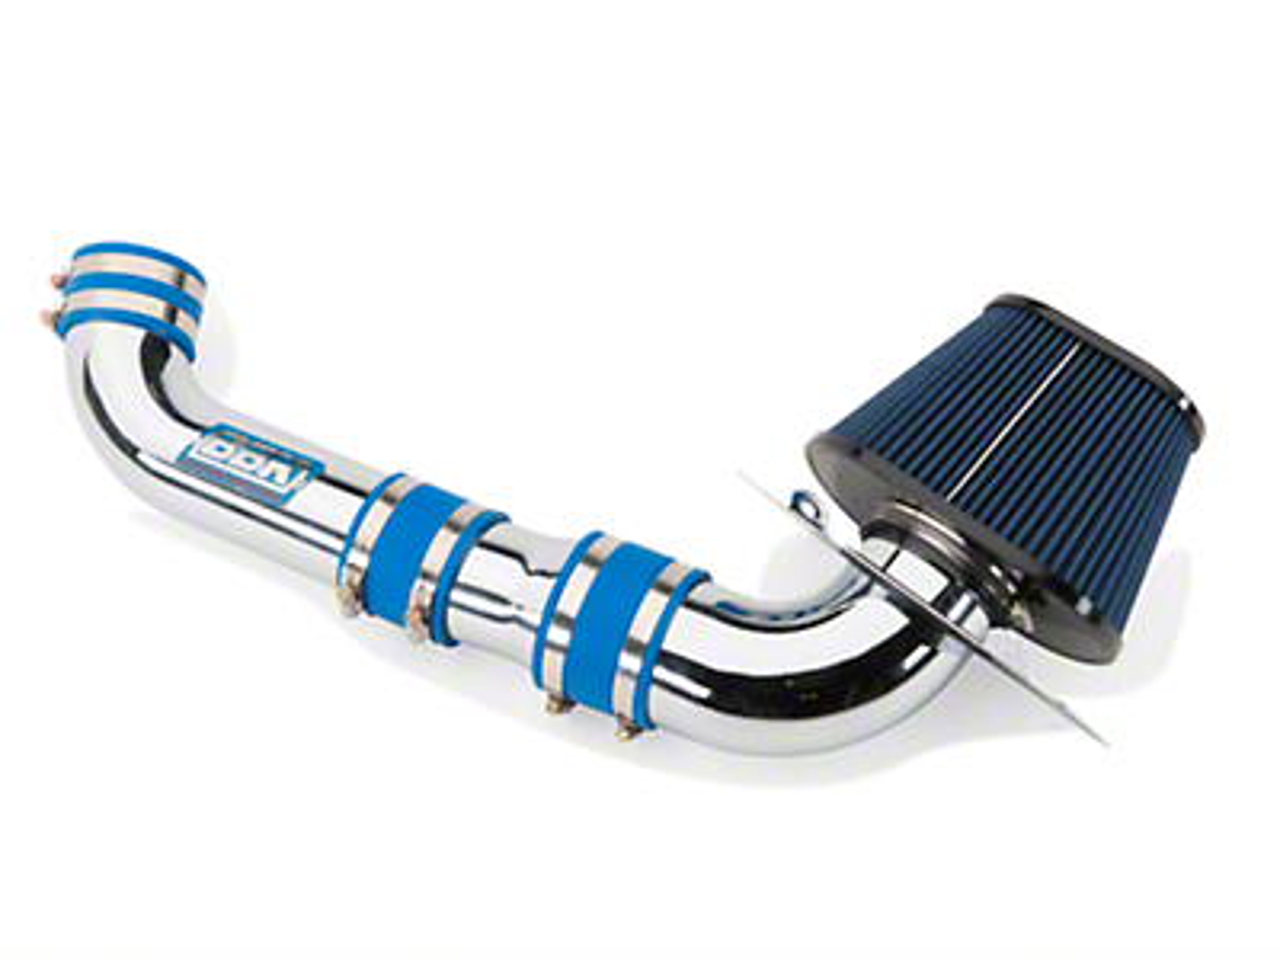 BBK Cold Air Intake w/ Speed Density Adapter (86-93 5.0L)